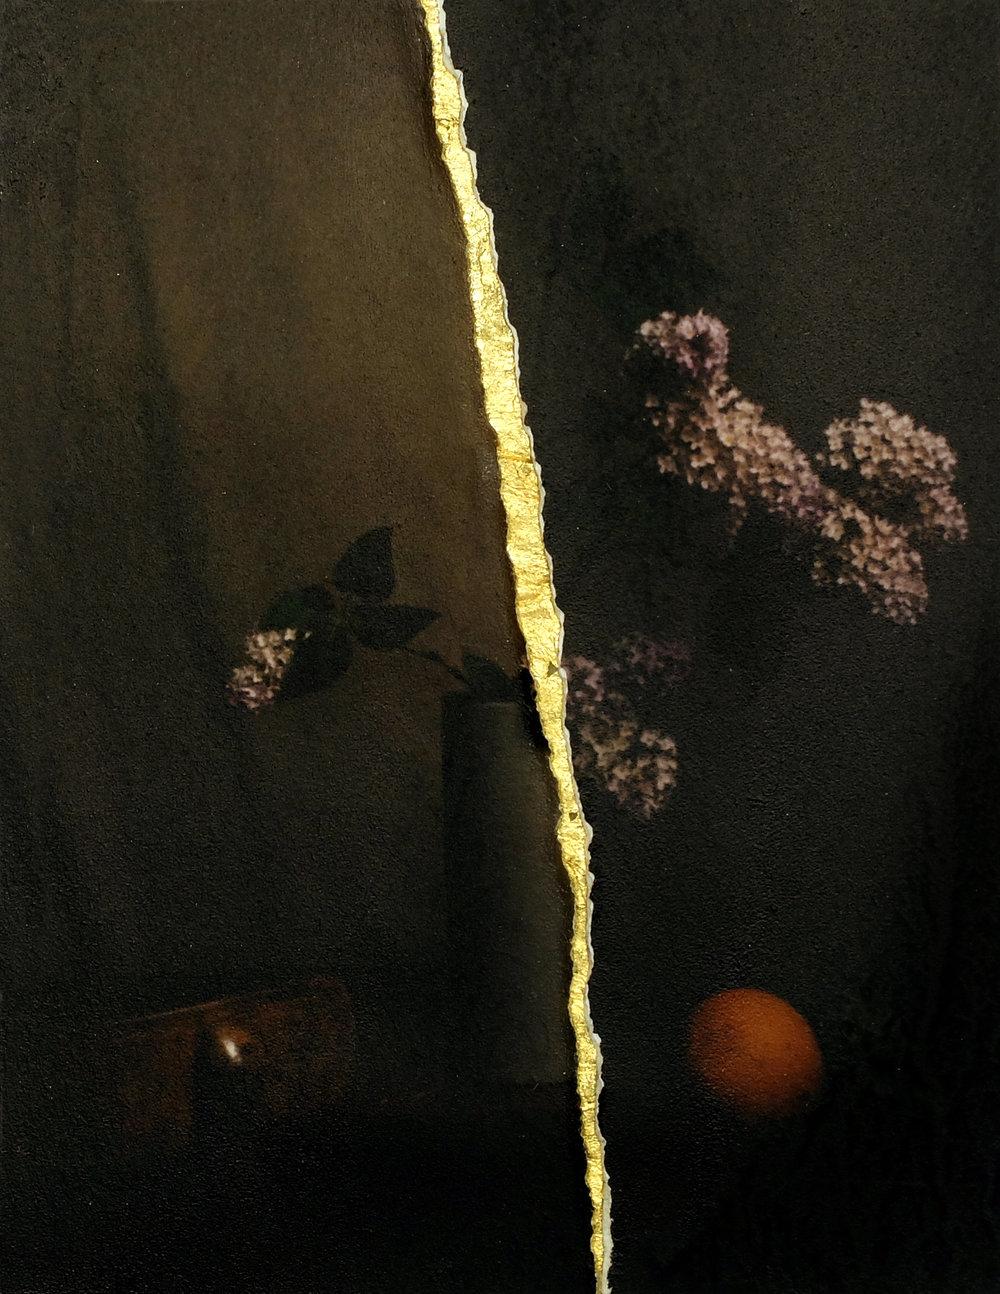 GTB_Fabien-Dettori_FD22_Courtesy Galerie Thierry Bigaignon.jpg